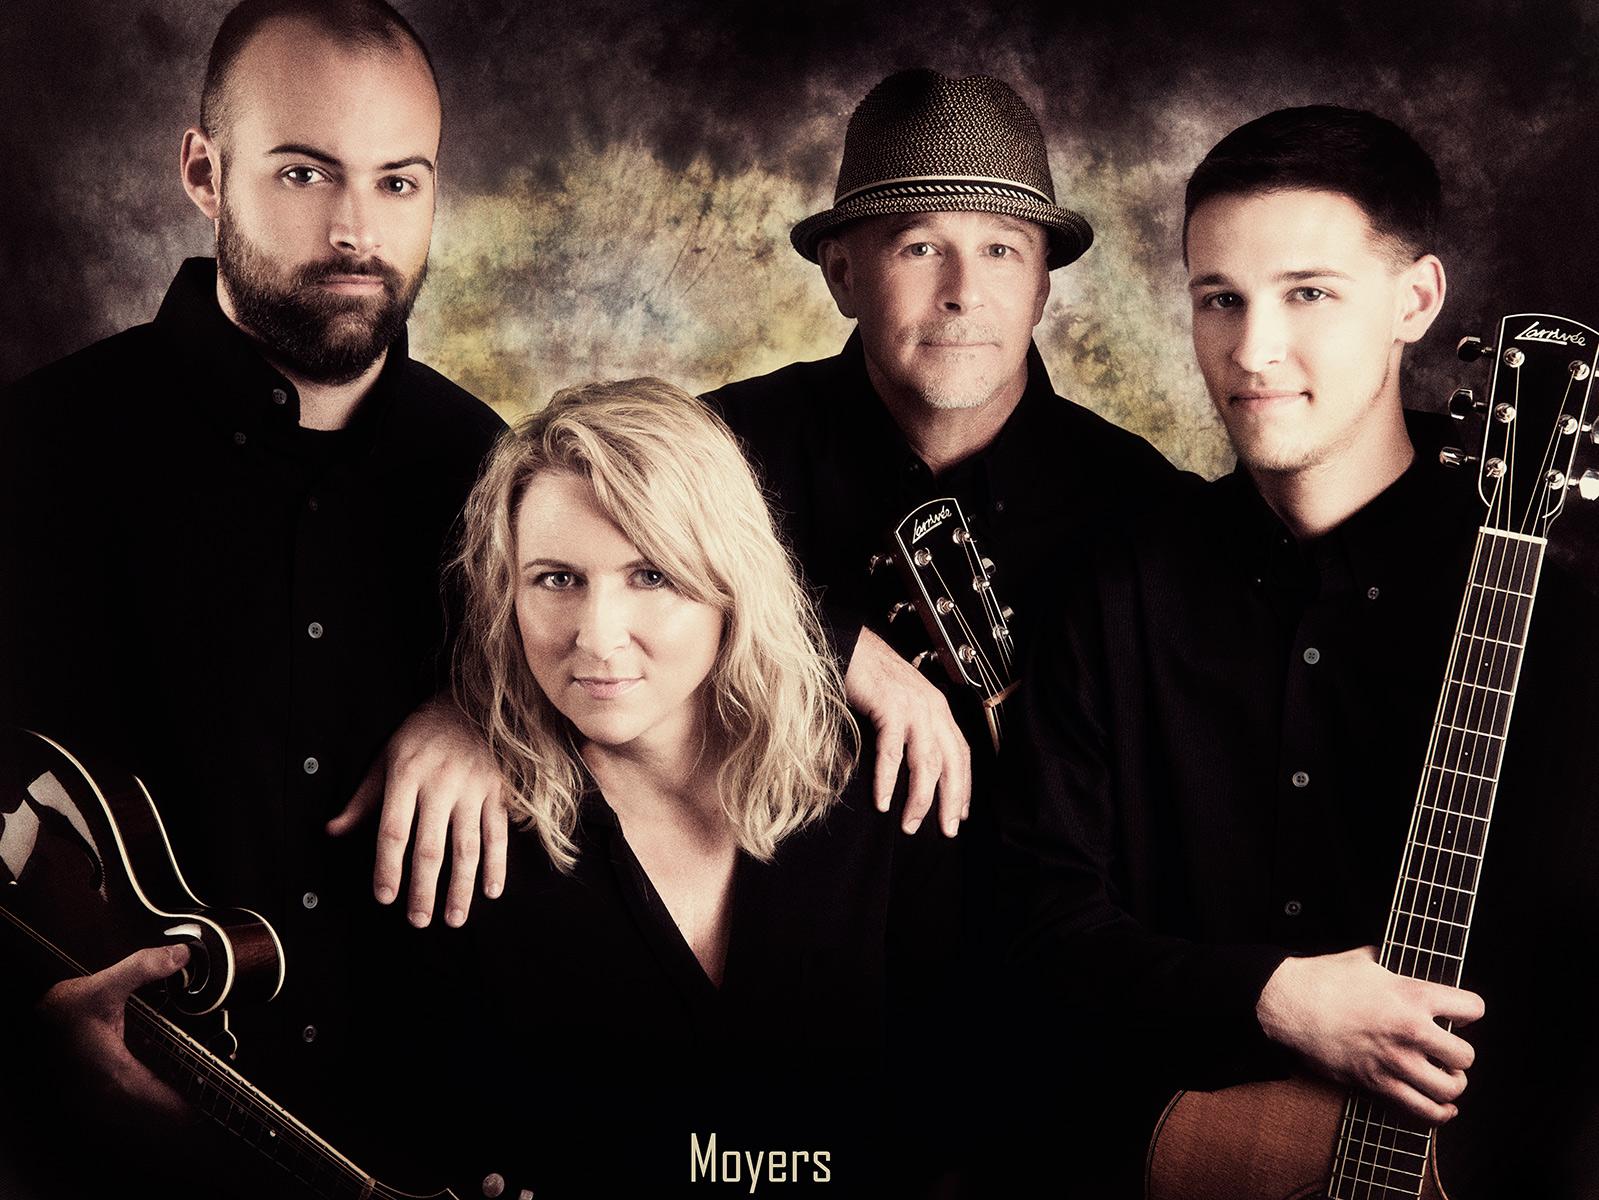 Moyers-Musicman Photography